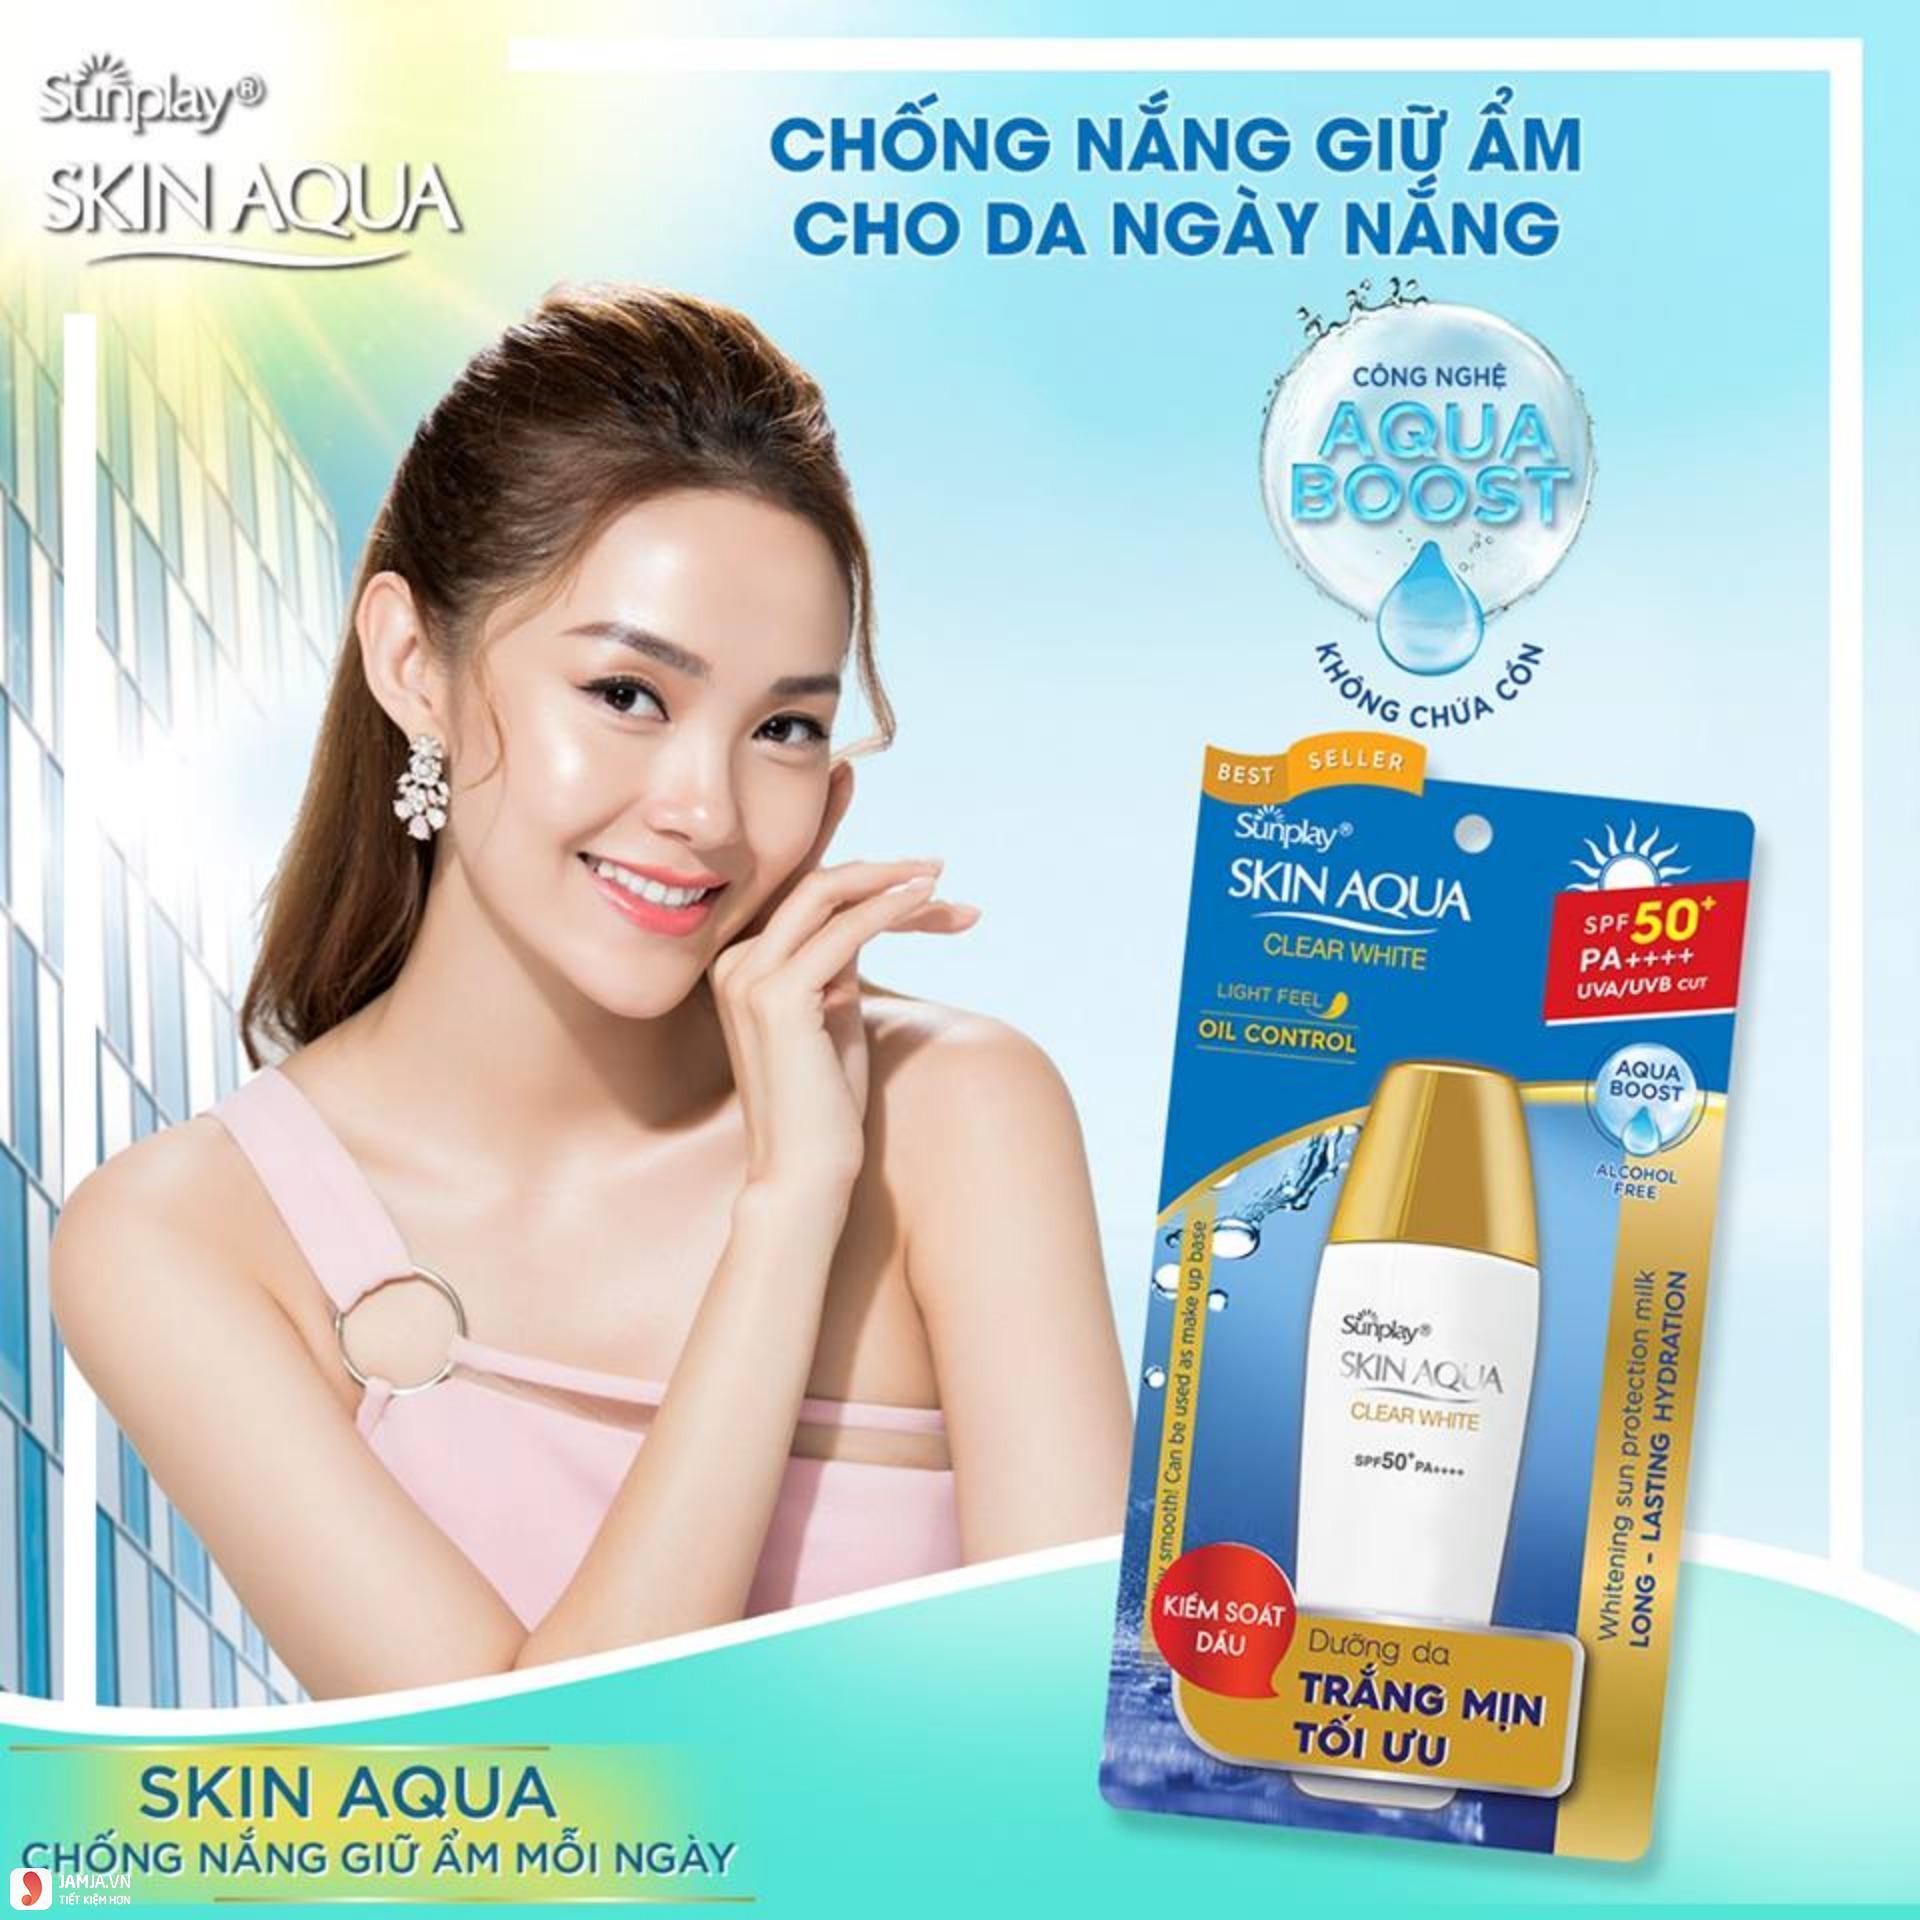 Kem chống nắng Skin Aqua Clear White 1